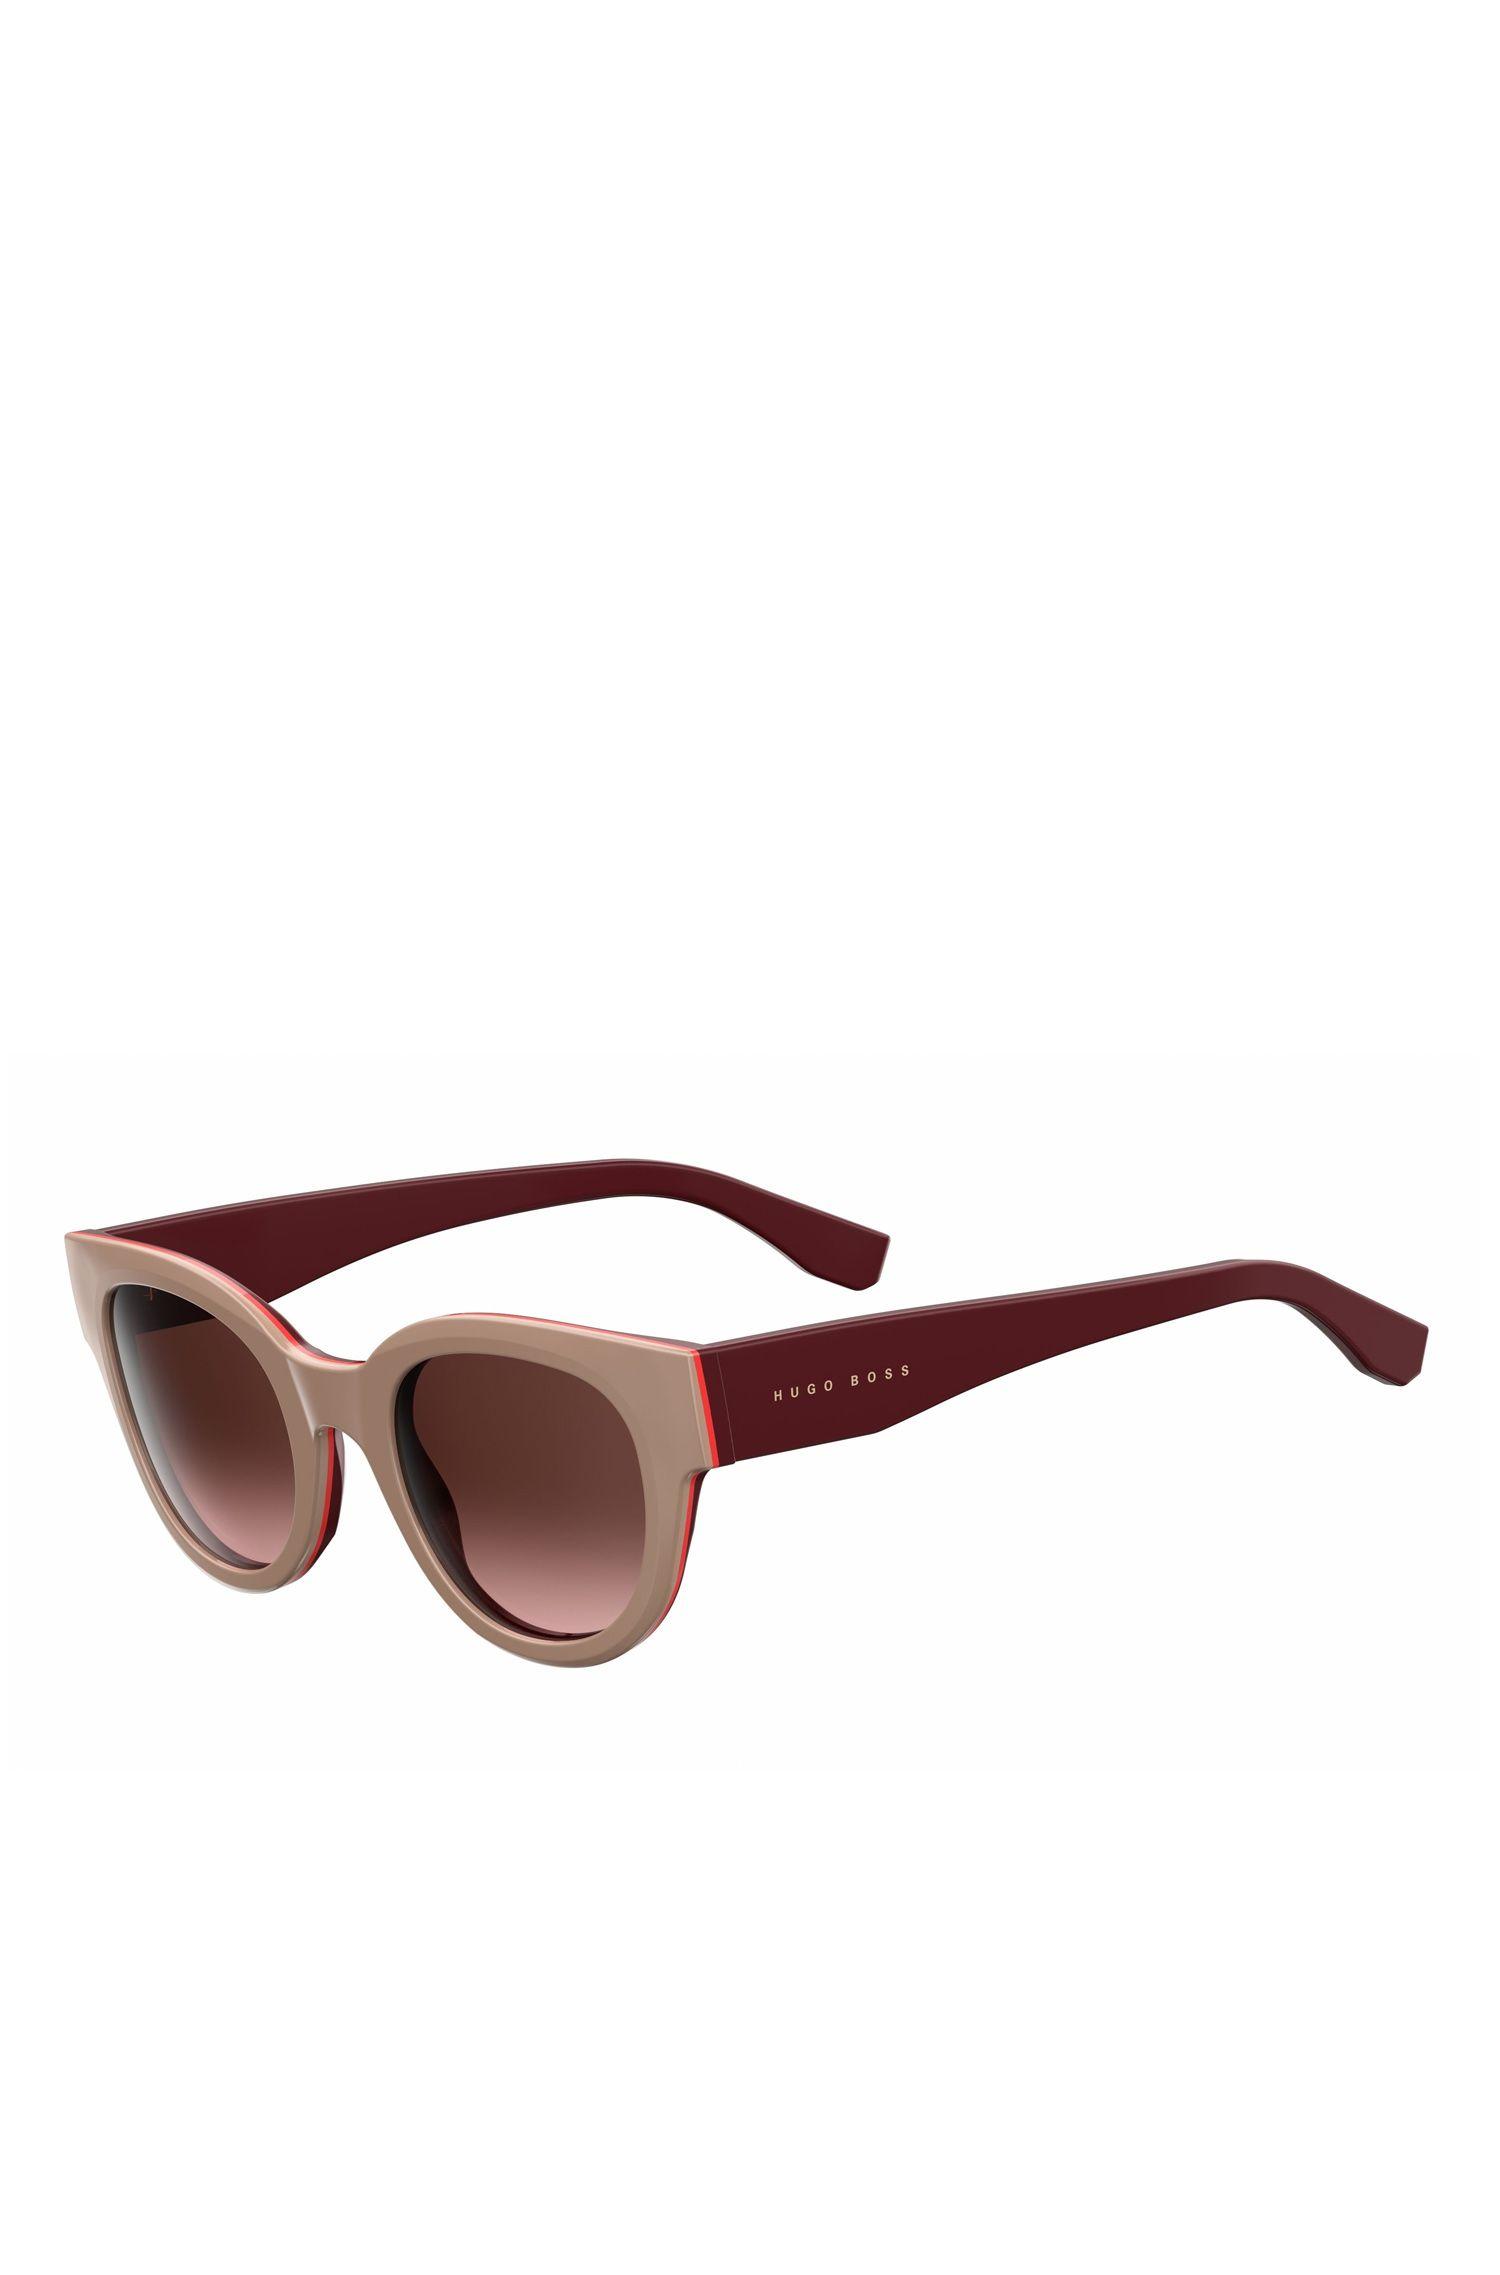 'BOSS 0888S' | Gradient Lens Block Cat Eye Sunglasses